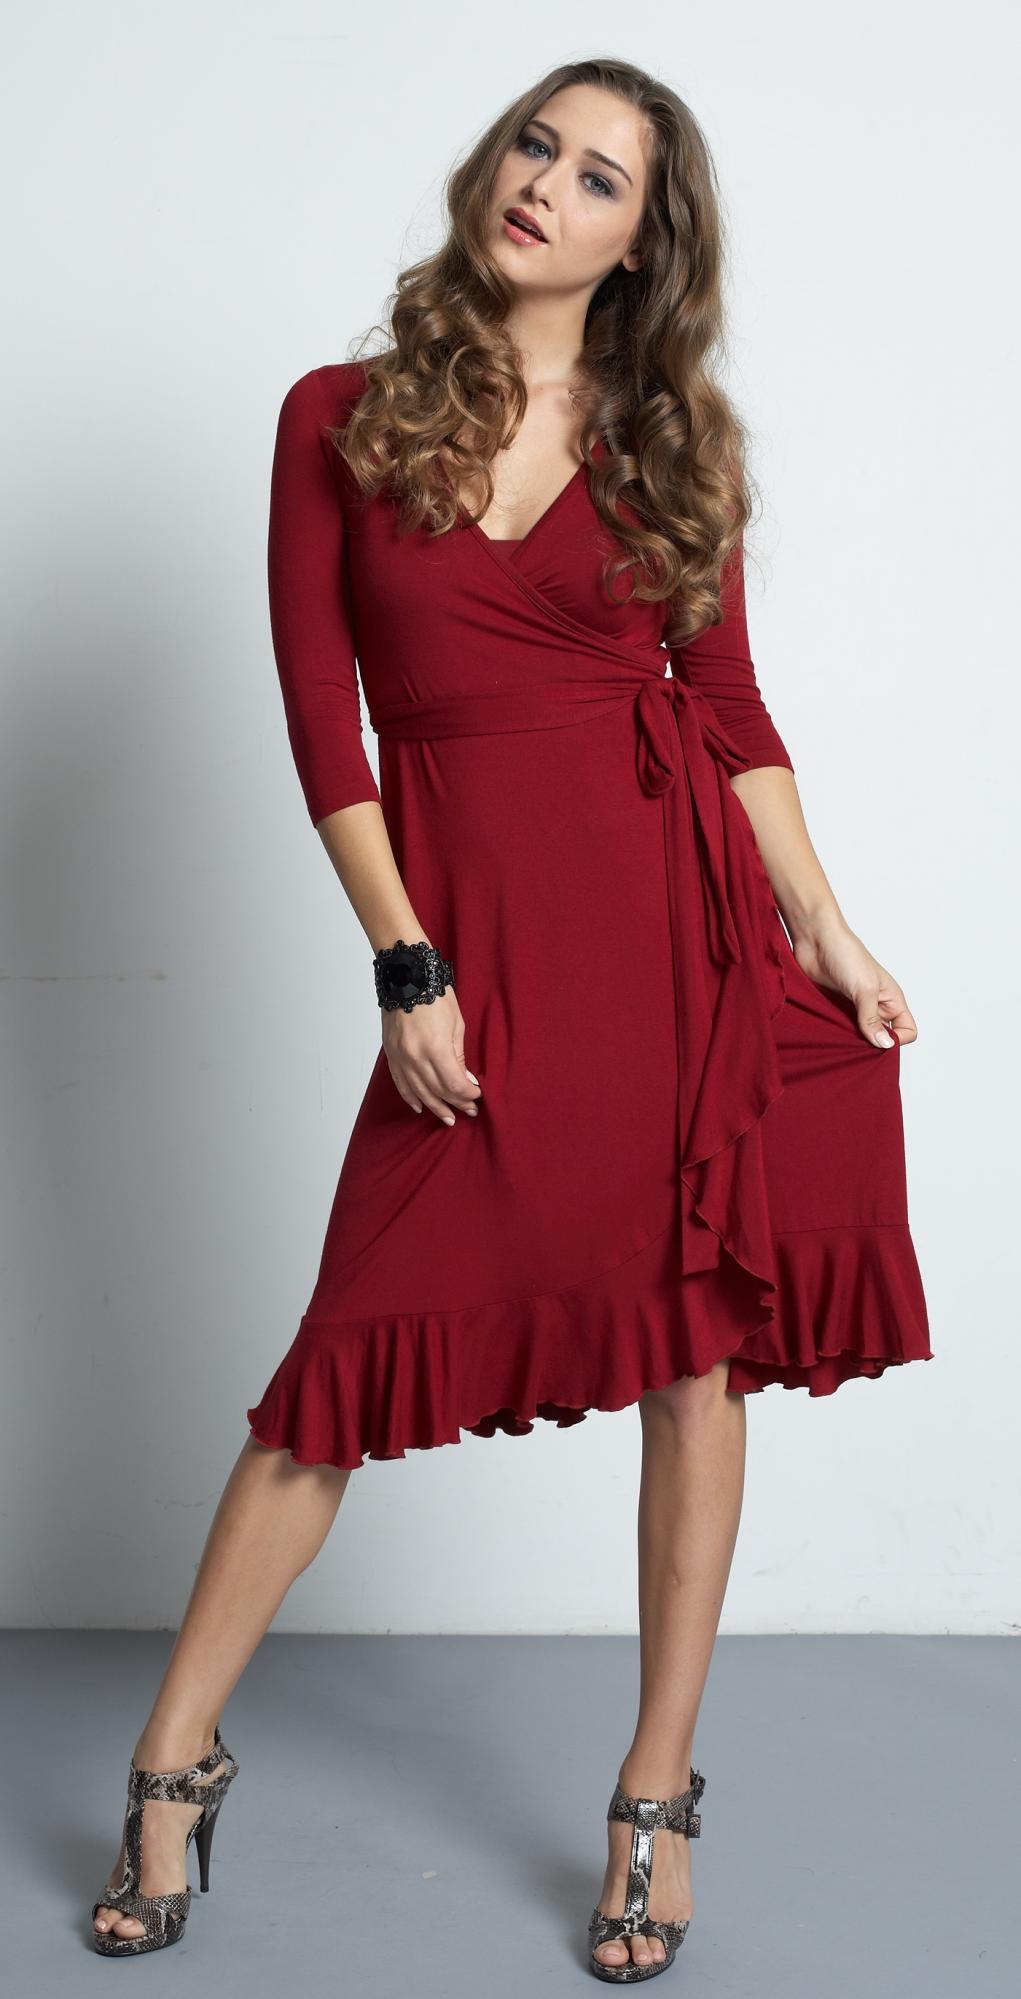 mother-en-vogue-flamenco-nursing-dress-red-3.jpg